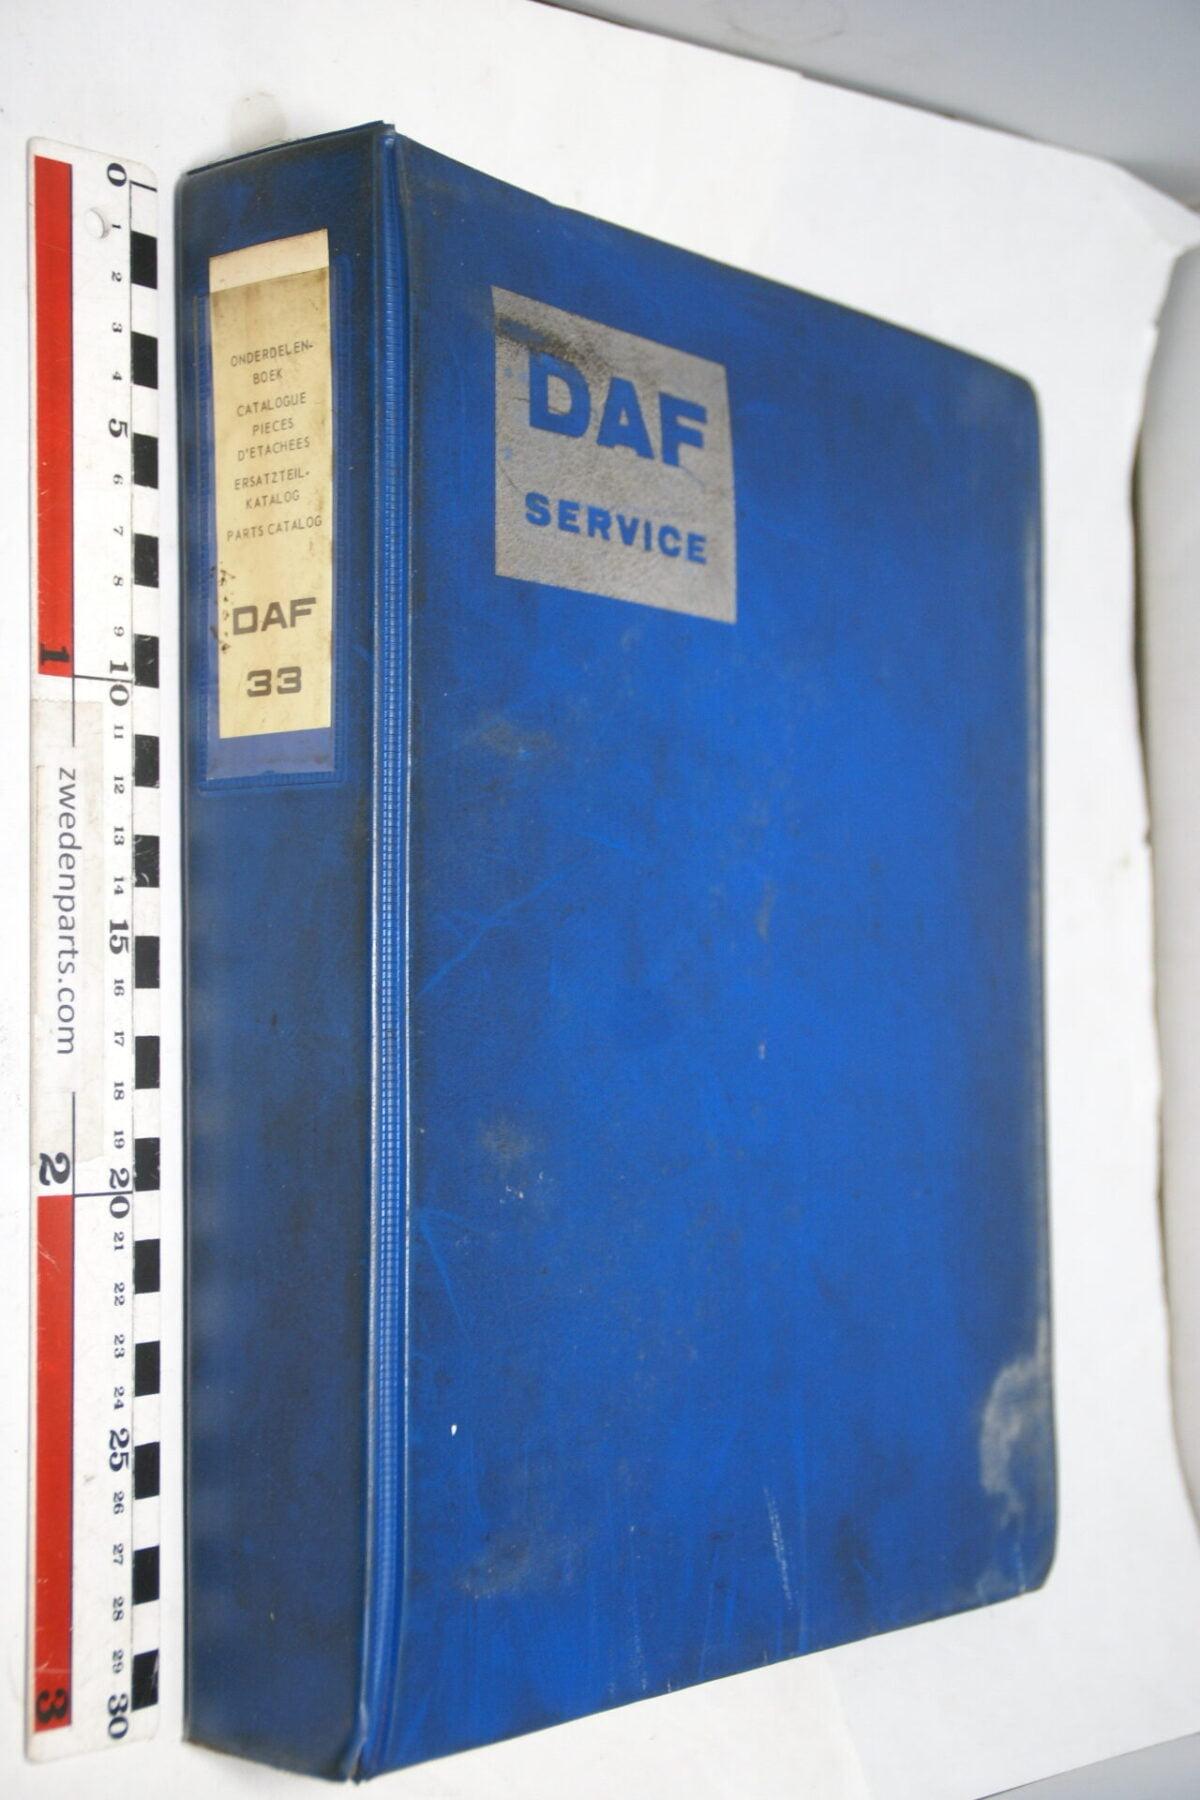 DSC01279 origineel DAF 33 onderdelenboek-d673ead3